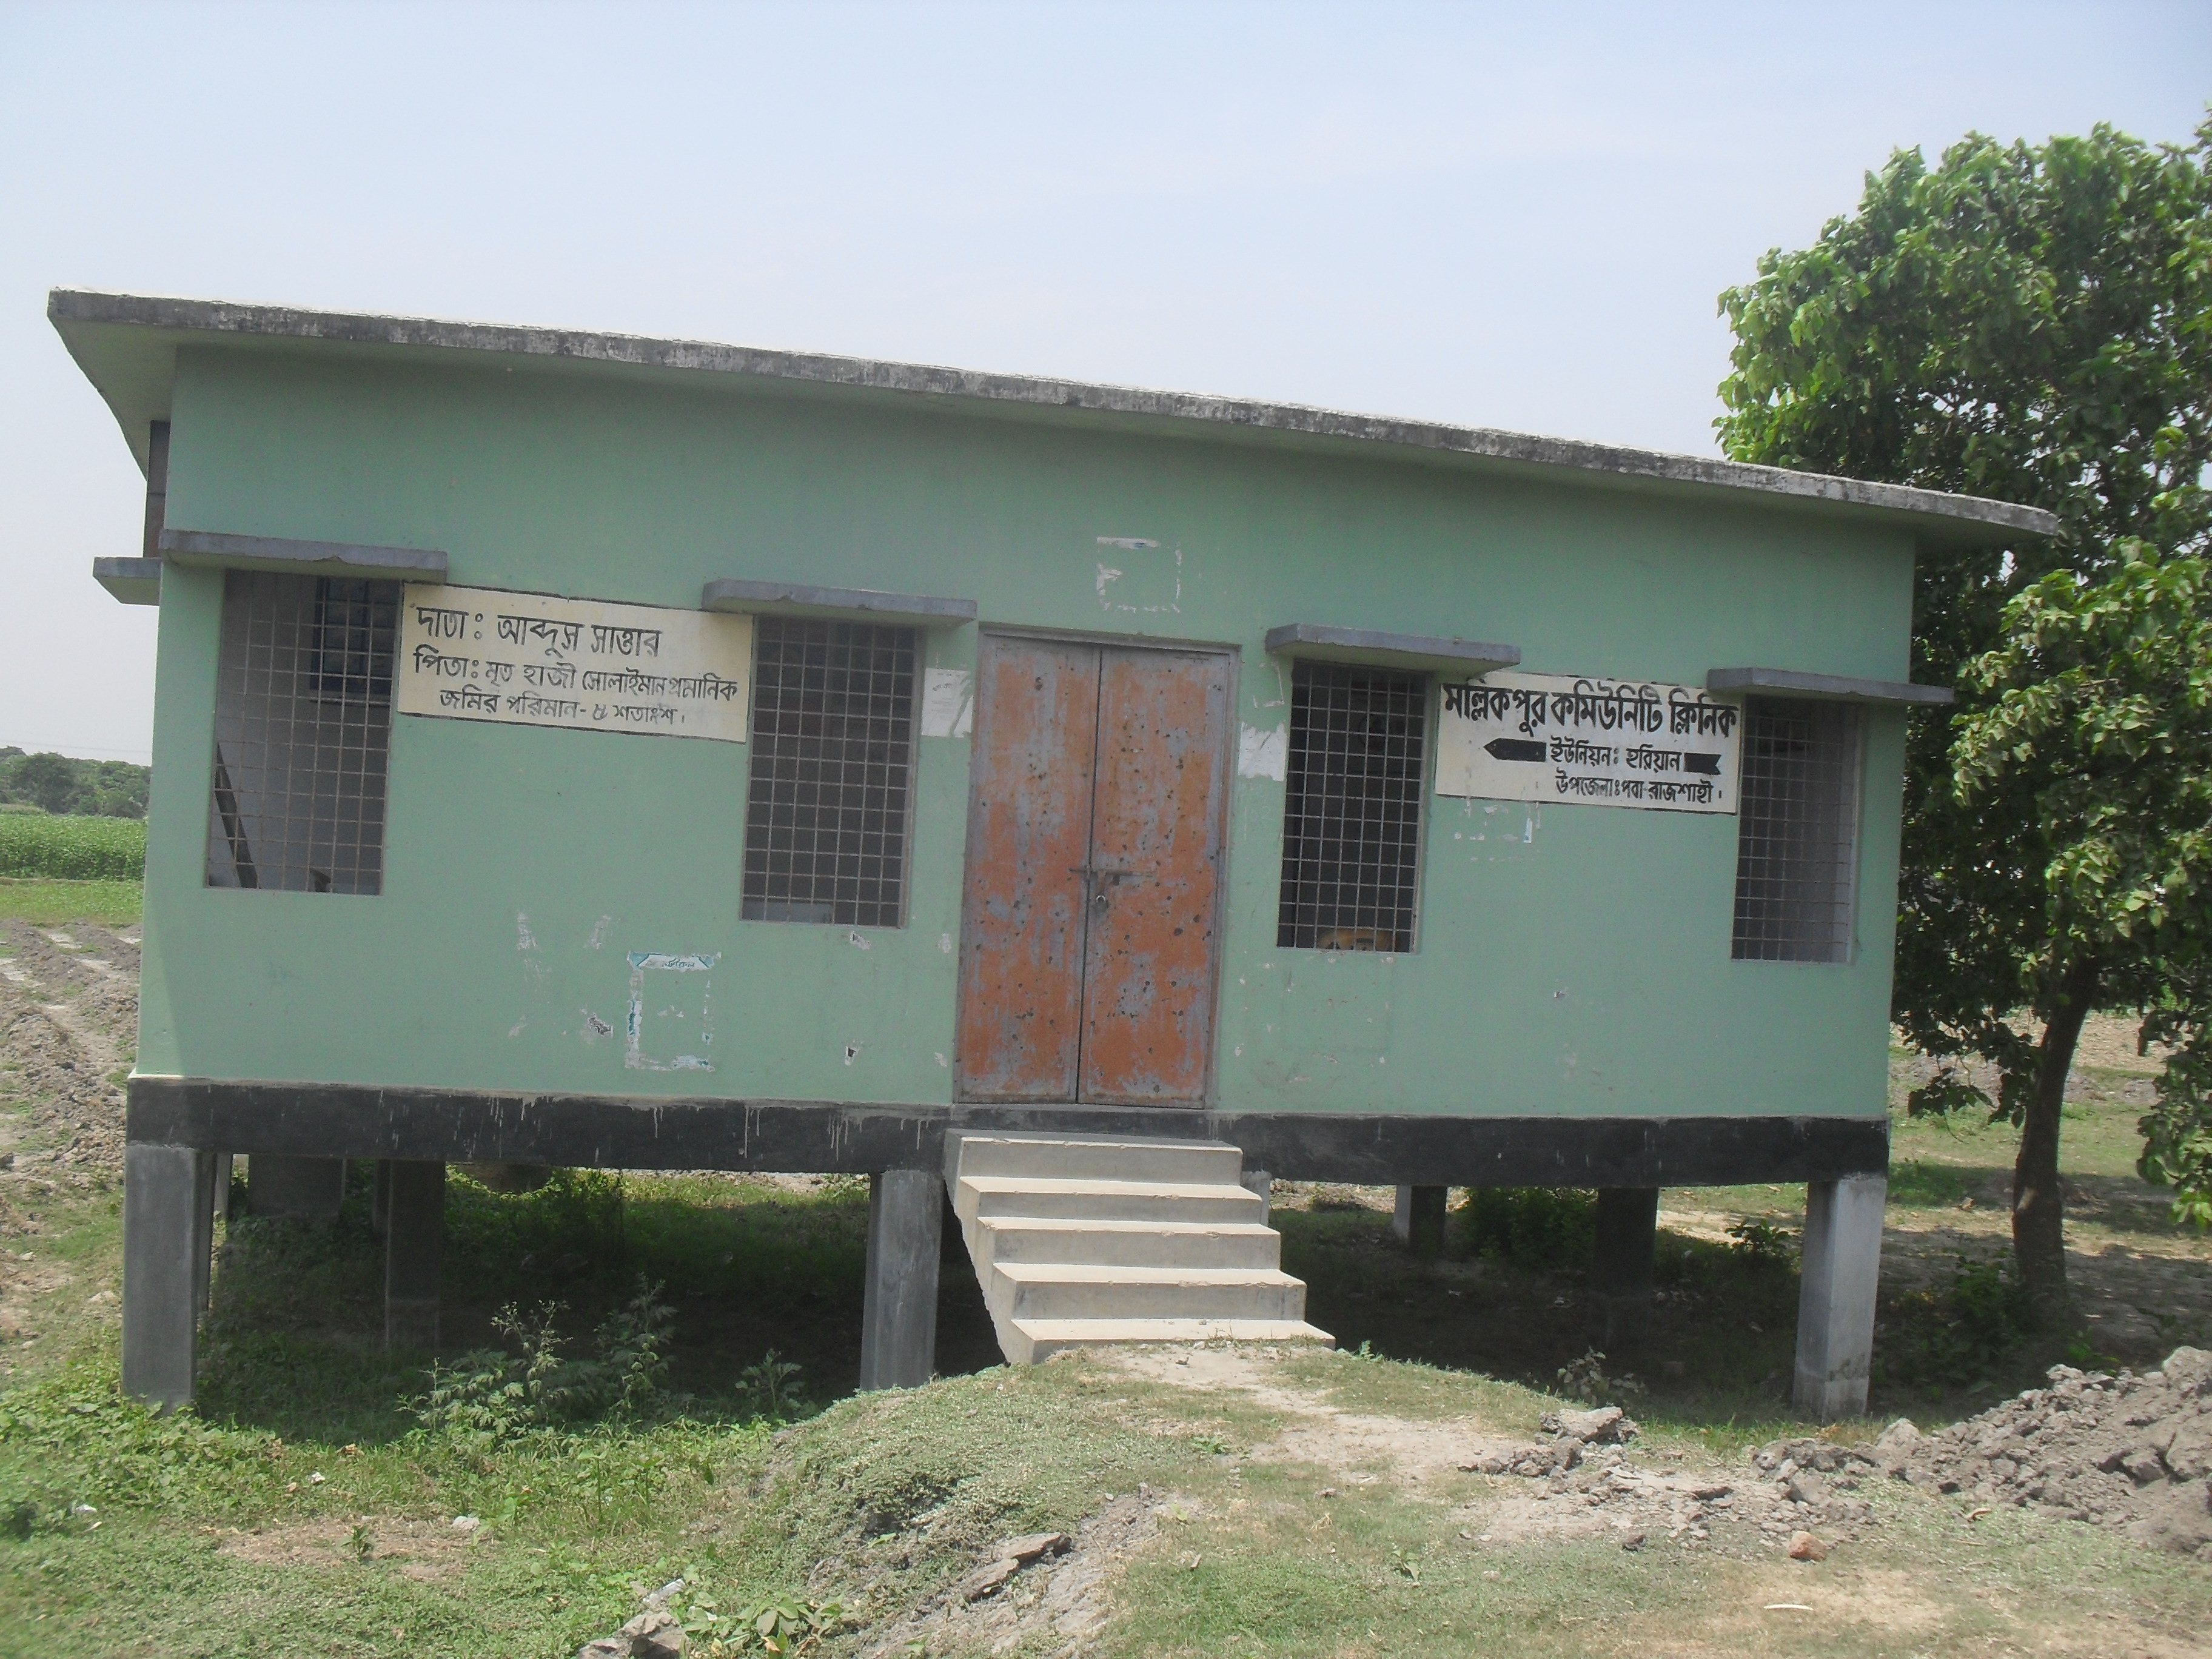 community clinic in bangladesh pdf